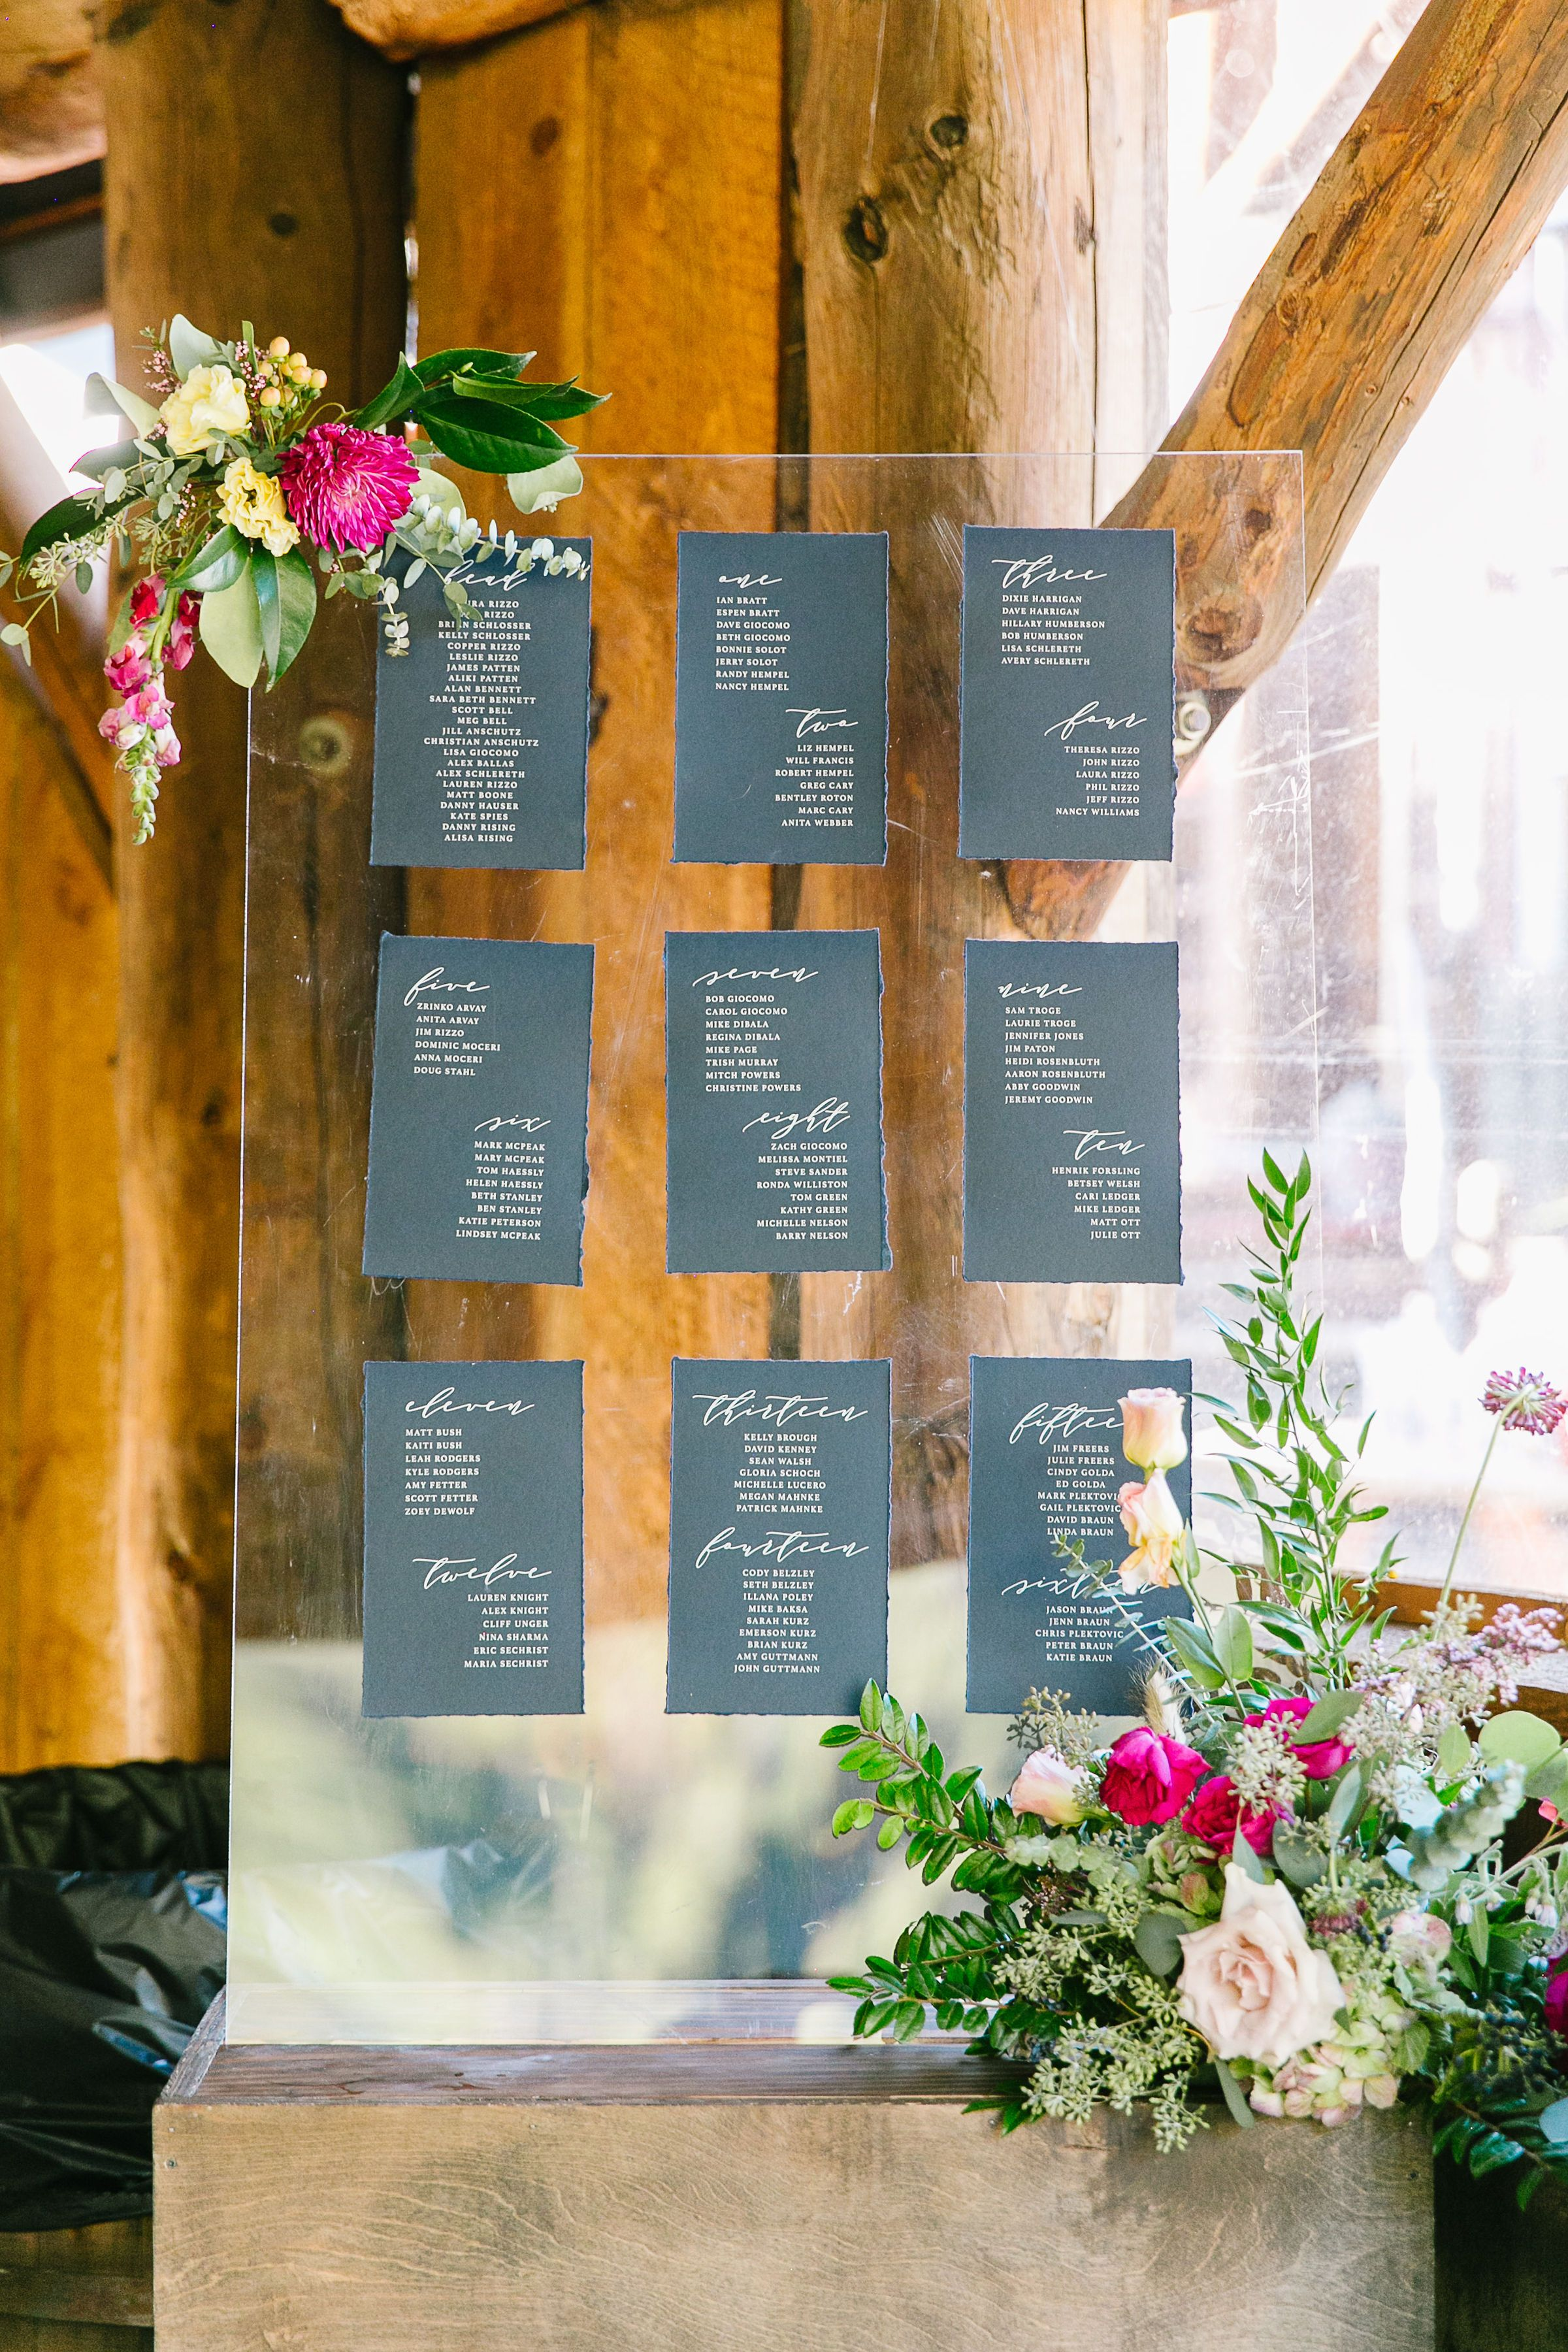 Modern Rustic Wedding Table Seating Chart- Navy Deckle Acrylic Table  Seating Chart Display | Rustic modern wedding, Seating chart wedding diy, Rustic  wedding table